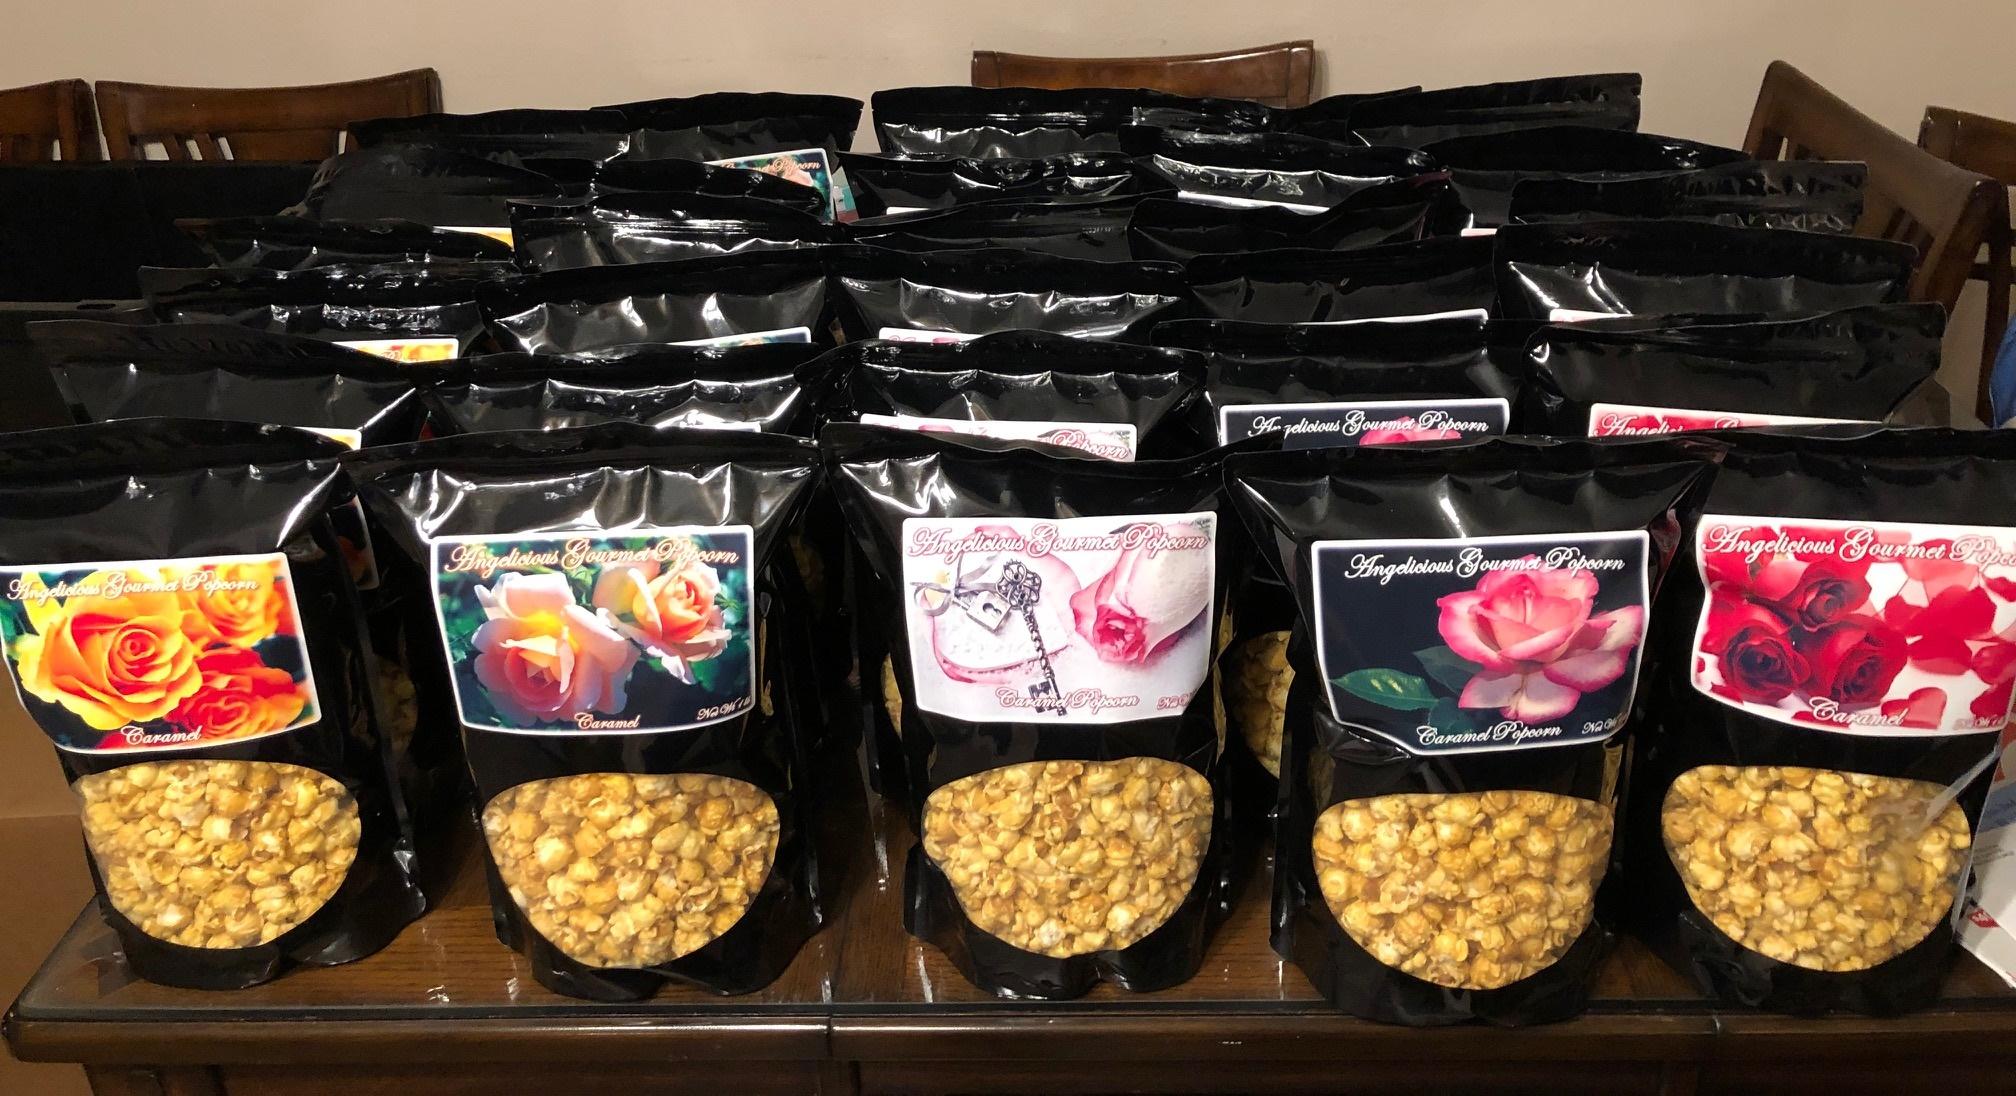 Angelicious Gourmet Popcorn Caramel 1 -